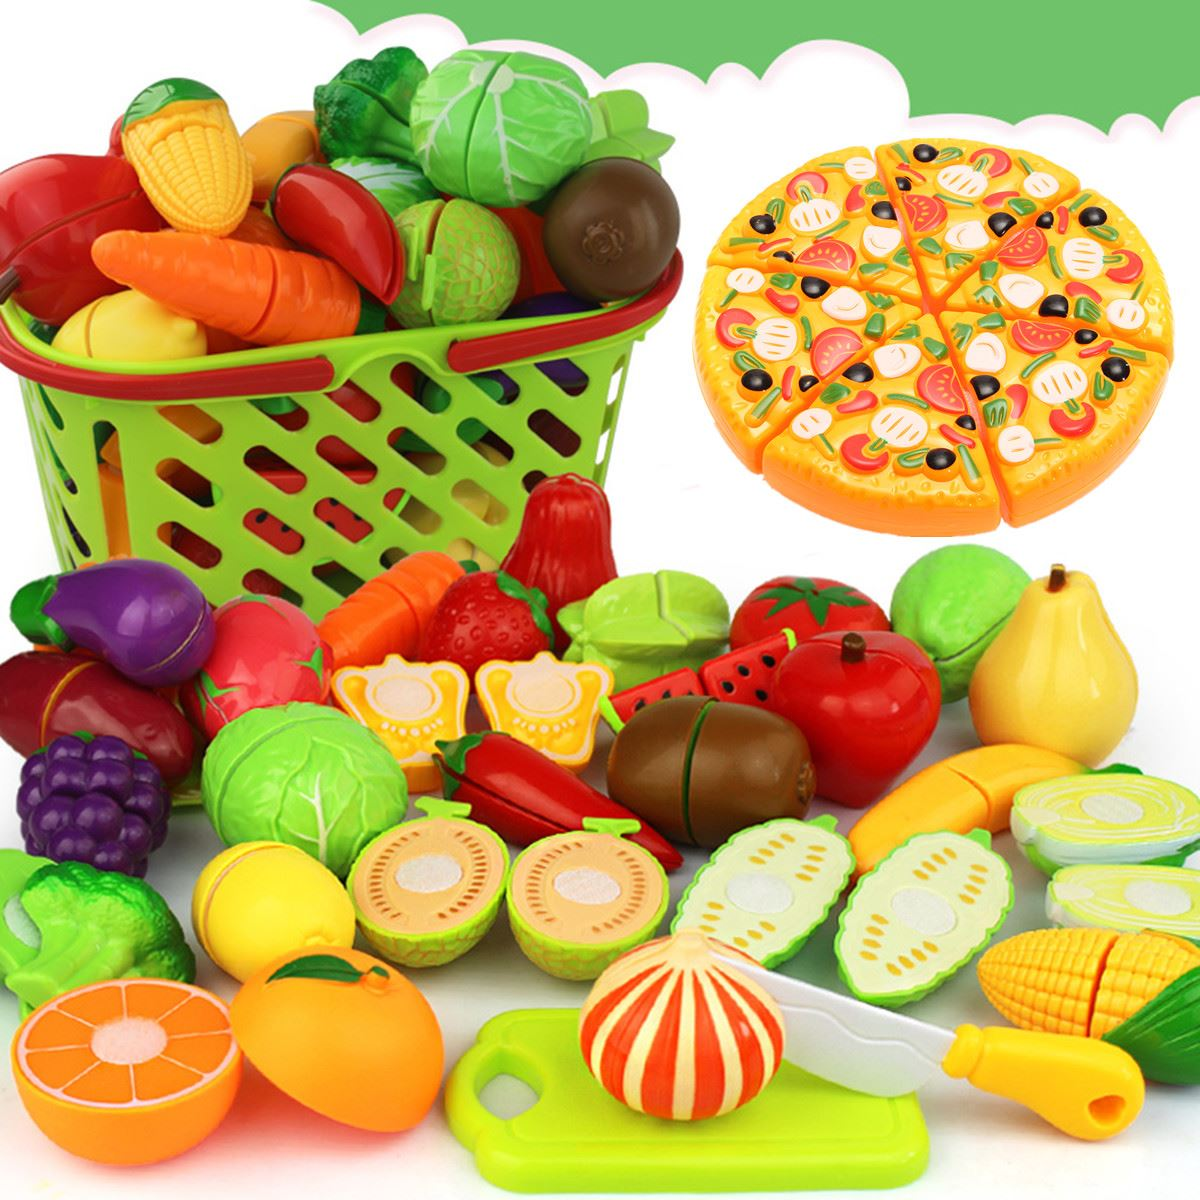 unidsset miniaturas fruta vegetal de cocina conjunto de juguete para nios pretend jugar